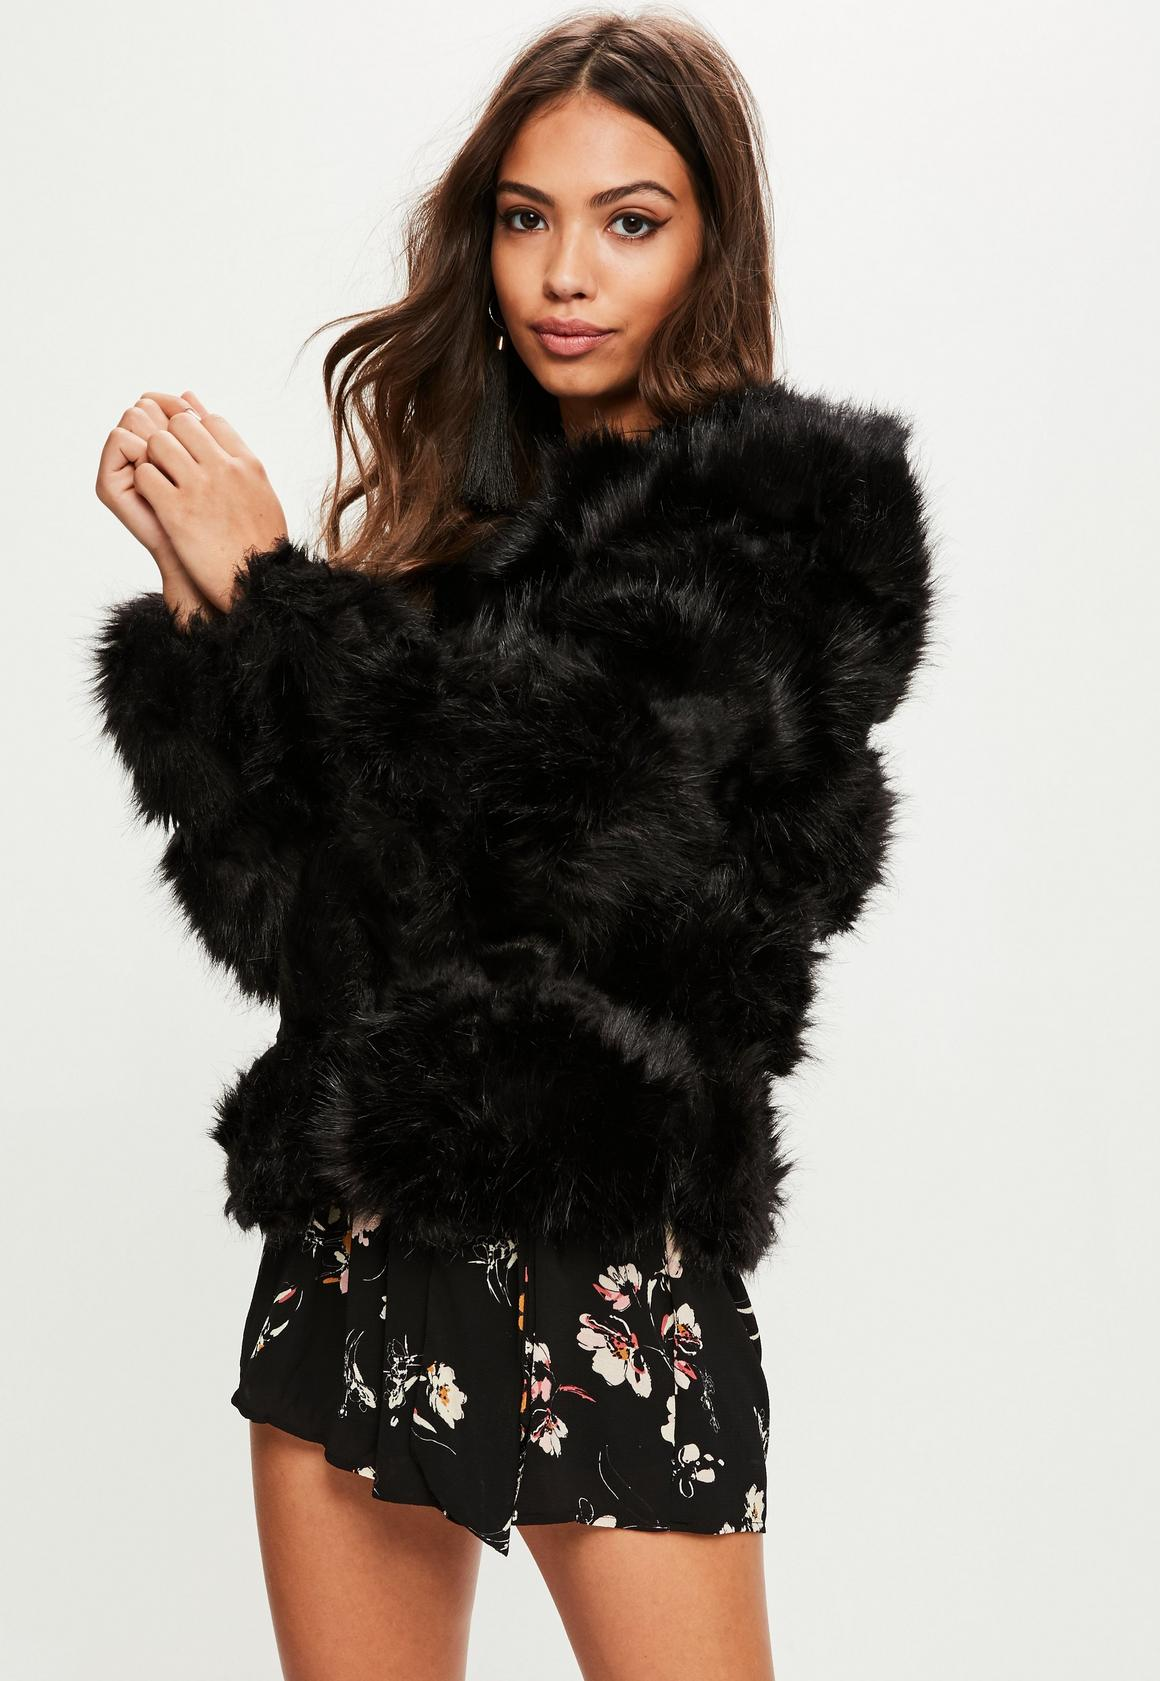 Black Pelted Short Faux Fur Jacket | Missguided Ireland